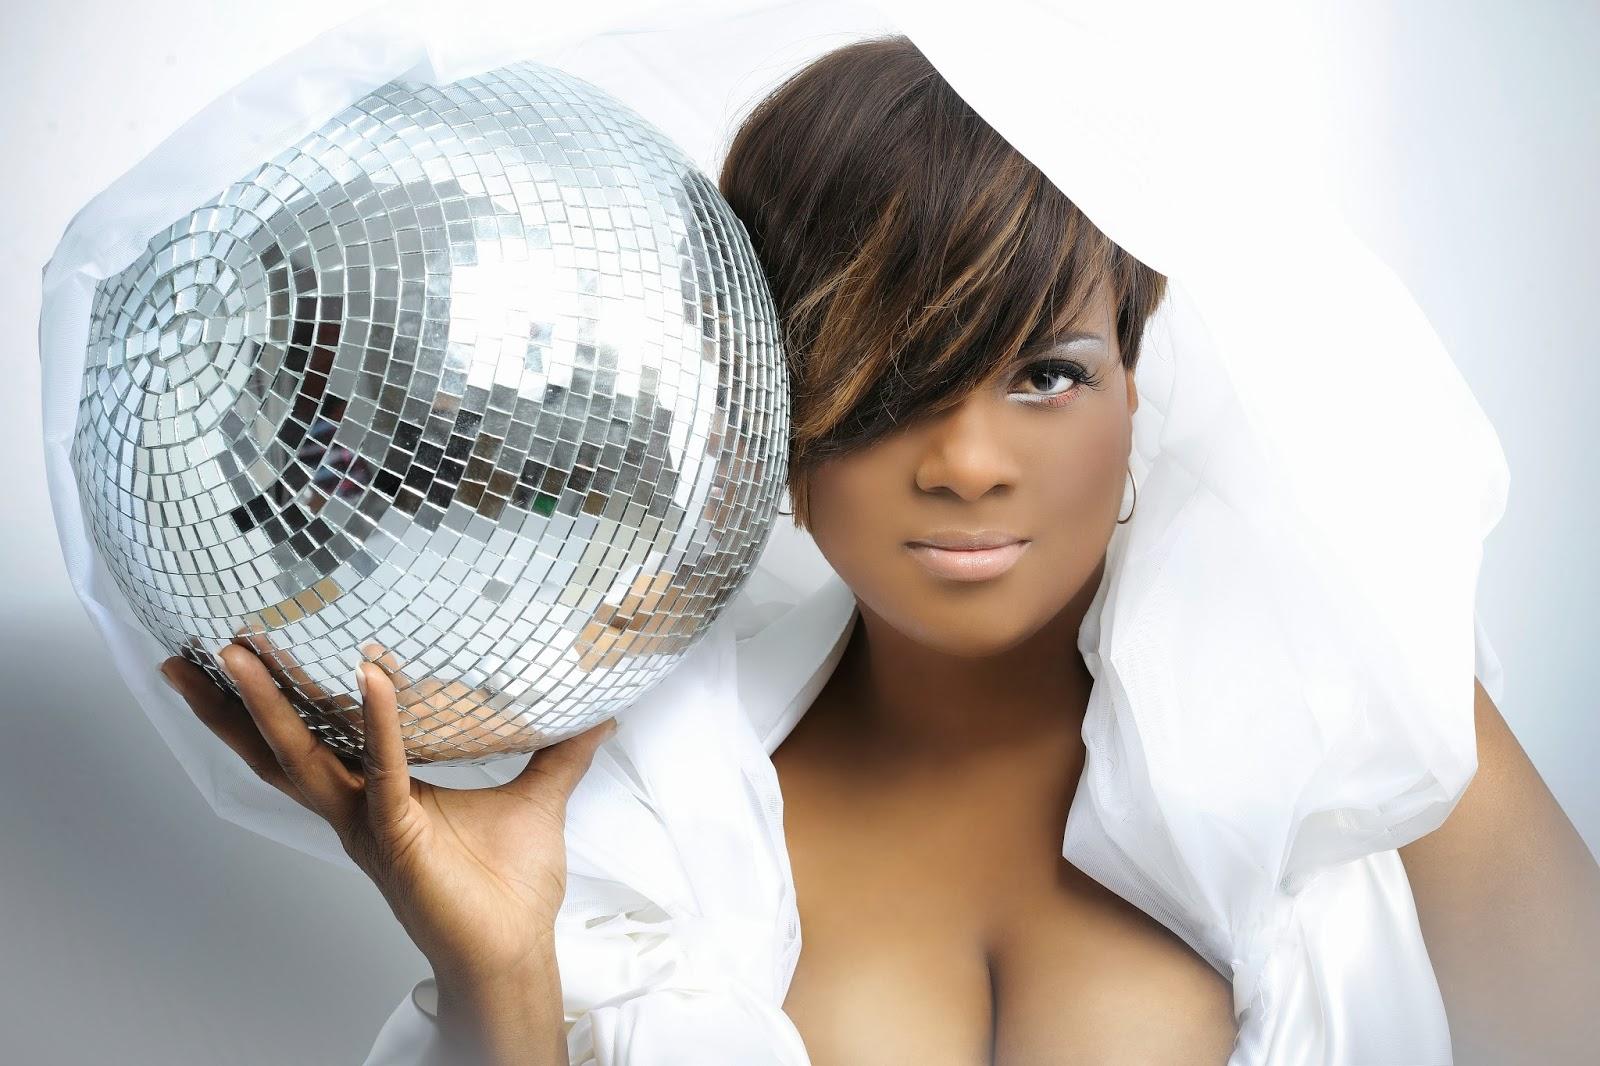 Haiducii Nude eurodance blog: 01/01/2014 - 02/01/2014